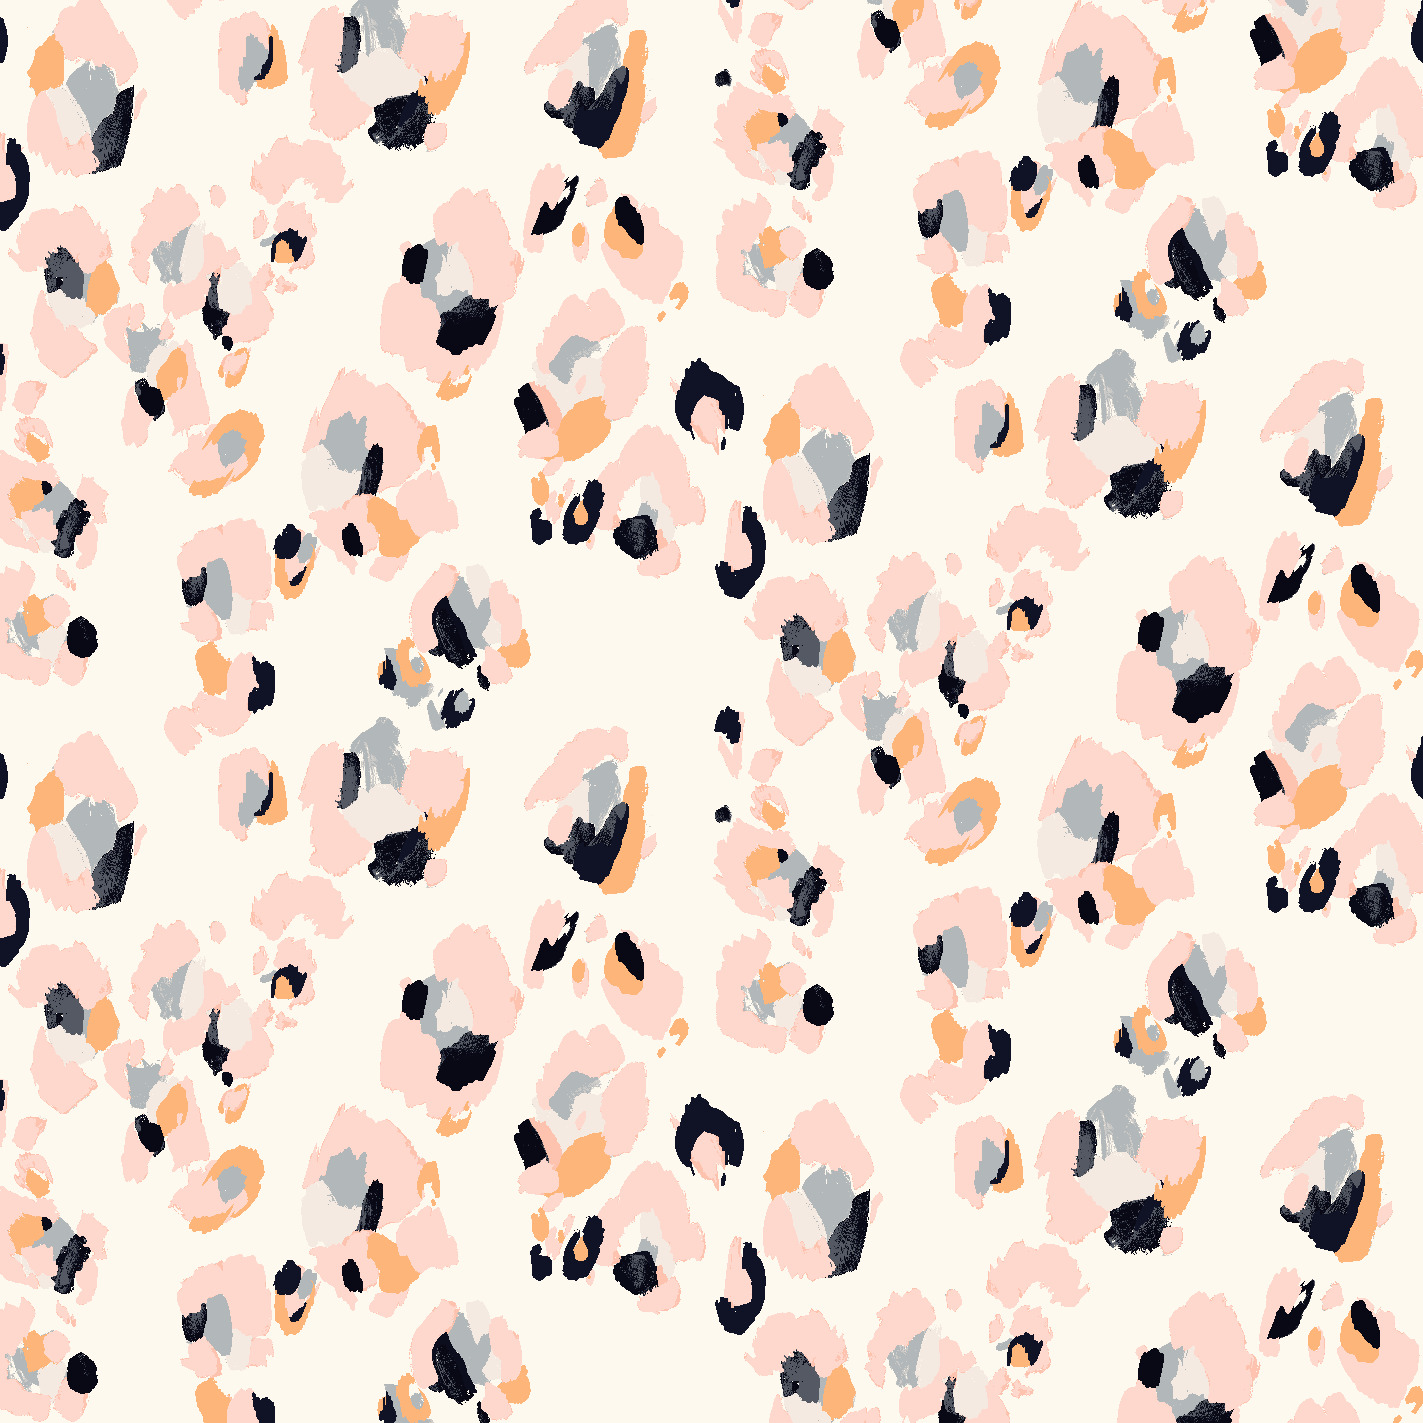 Baby pink cheetah print background - photo#30